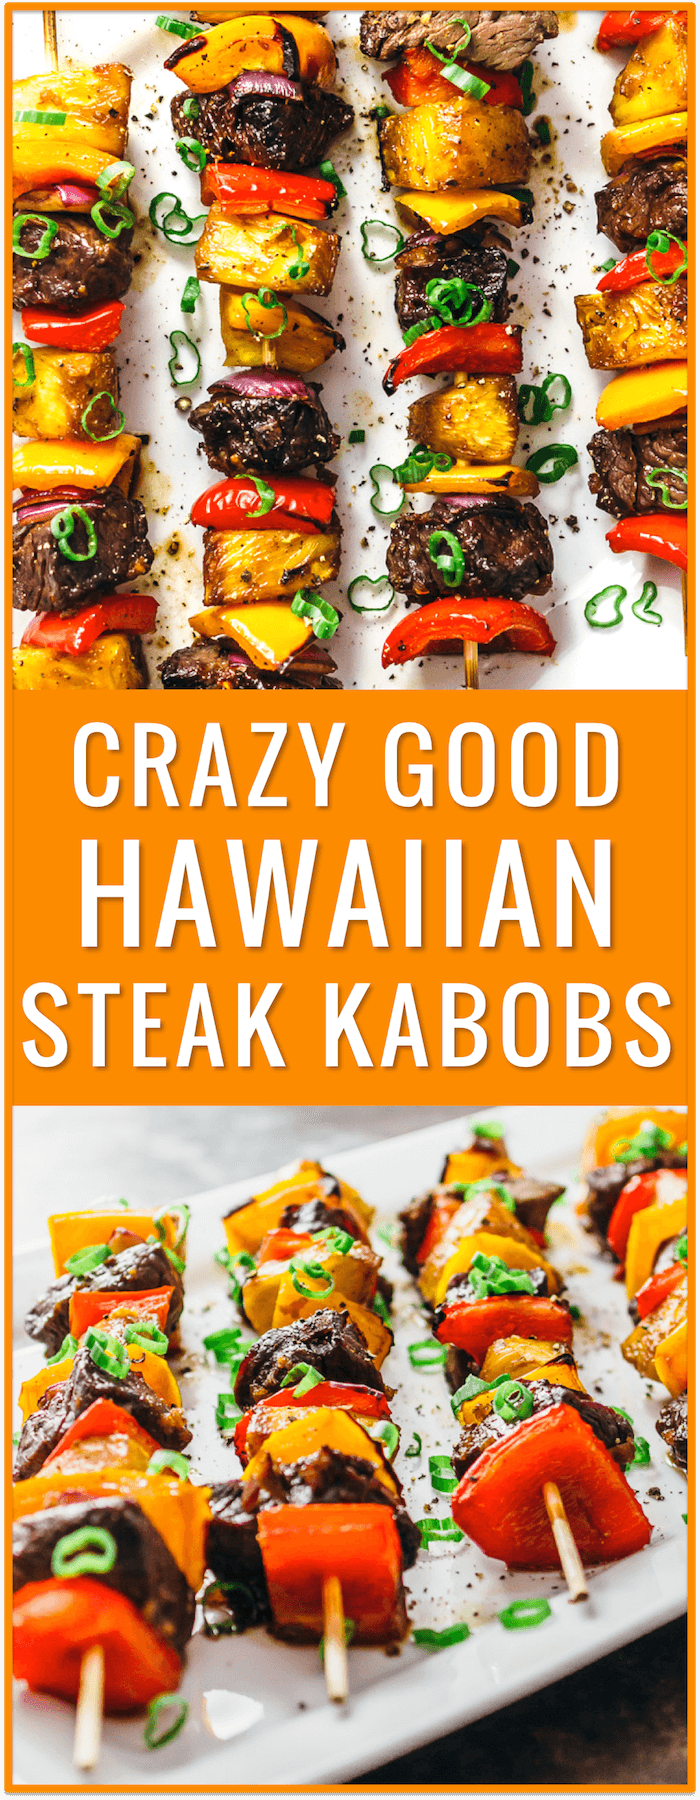 Crazy good Hawaiian steak kabobs, Hawaiian steak marinade, easy, recipe, grilling, broiling, baking, beef kabobs on the grill, beef kabob marinade, baked kabobs, ground beef kabobs, beef kabobs in the oven, broiled kabobs, with rice, marinated, sides, greek, teriyaki, healthy, shrimp